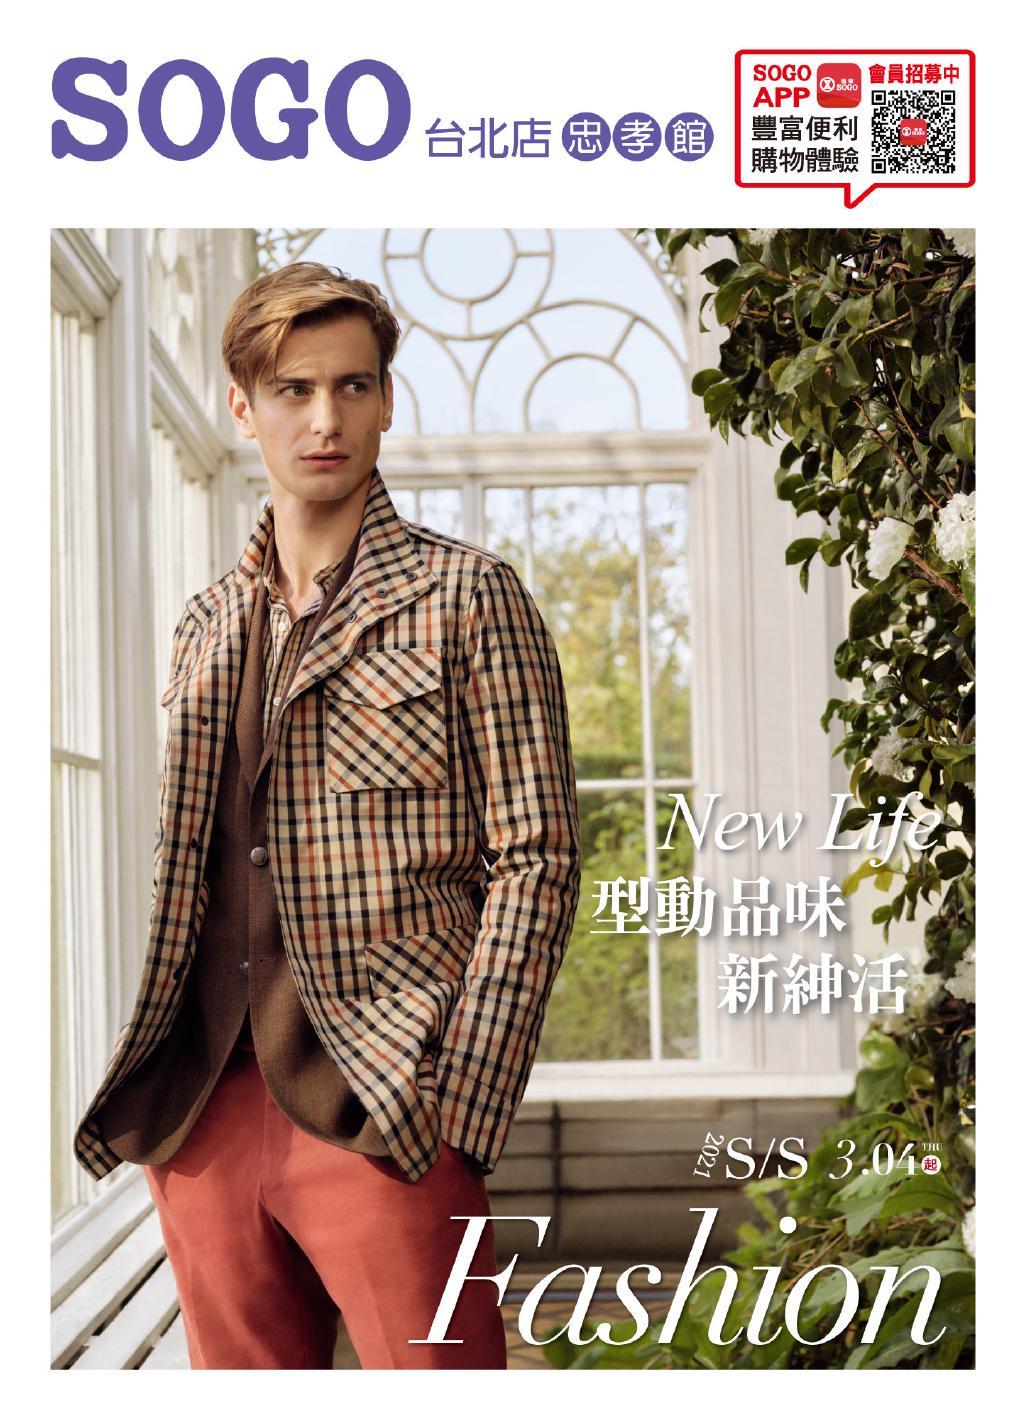 SOGO《台北忠孝館》DM 「New Life型動品味 新紳活 2021 S/S Fashion」【2021/3/31 止】